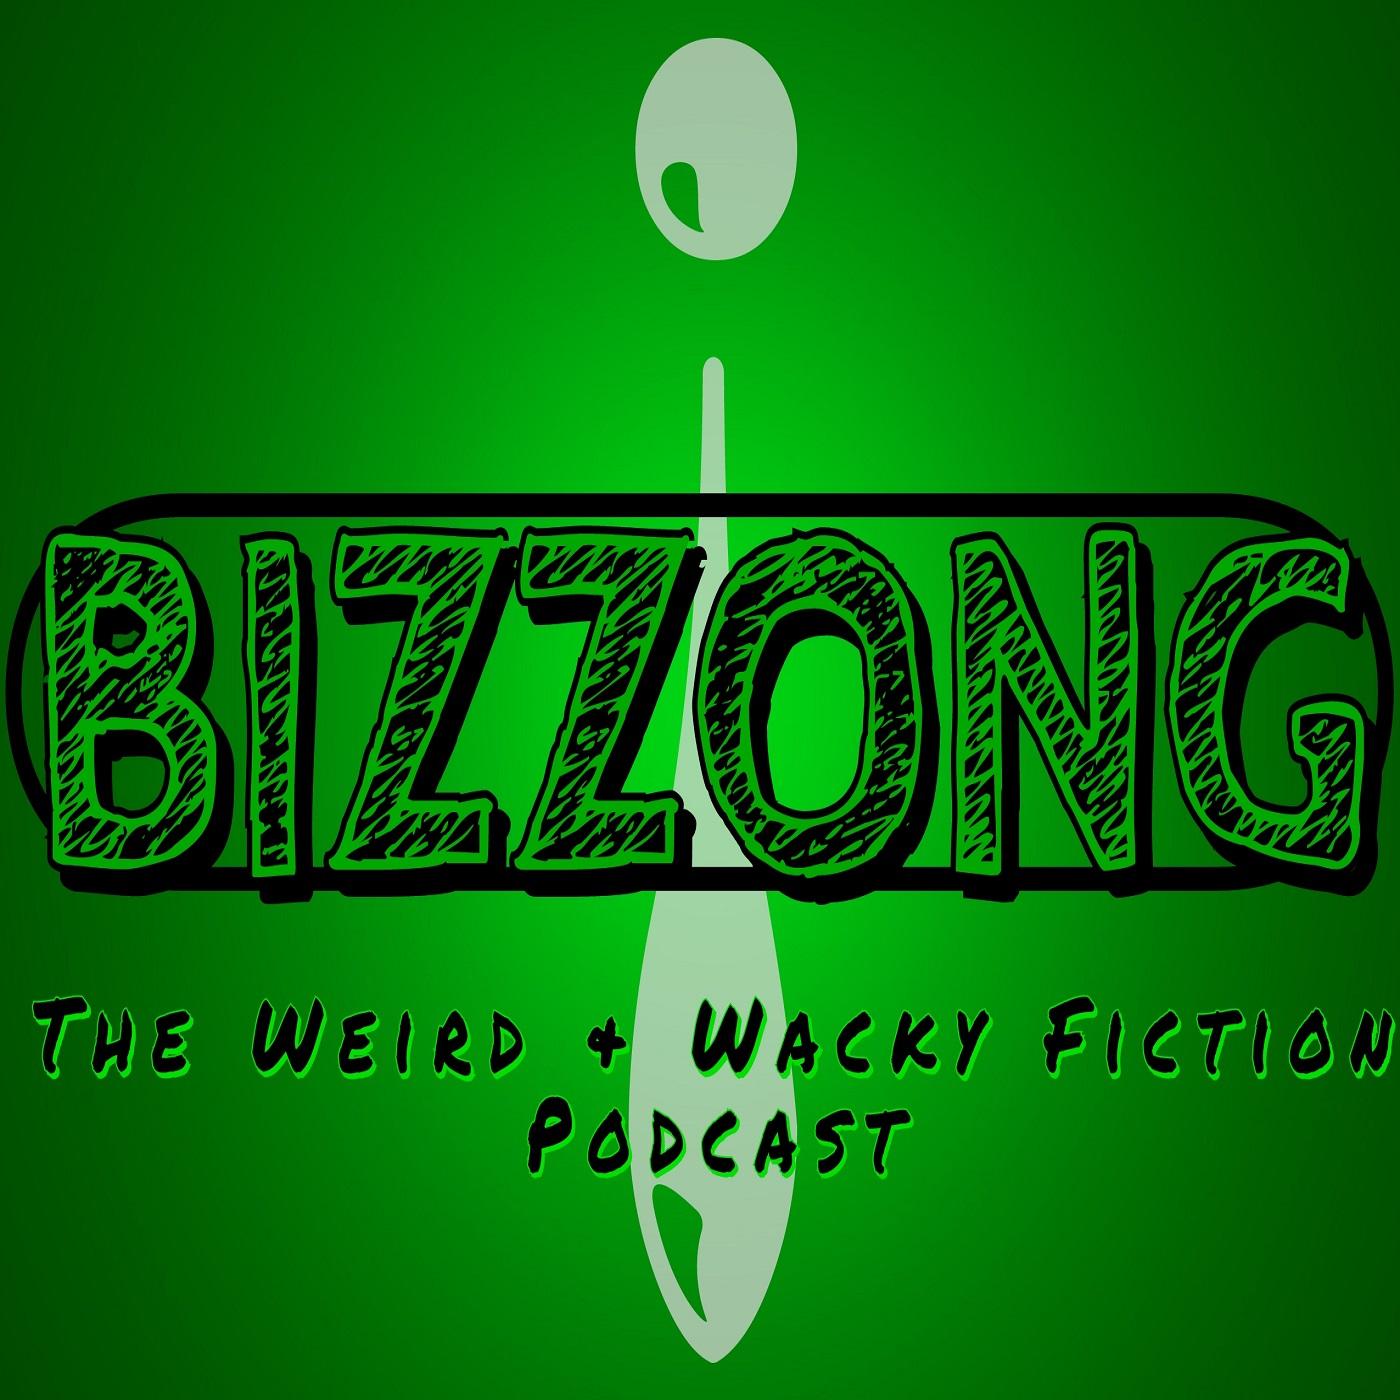 Bizzong! The Weird and Wacky Fiction Podcast show art